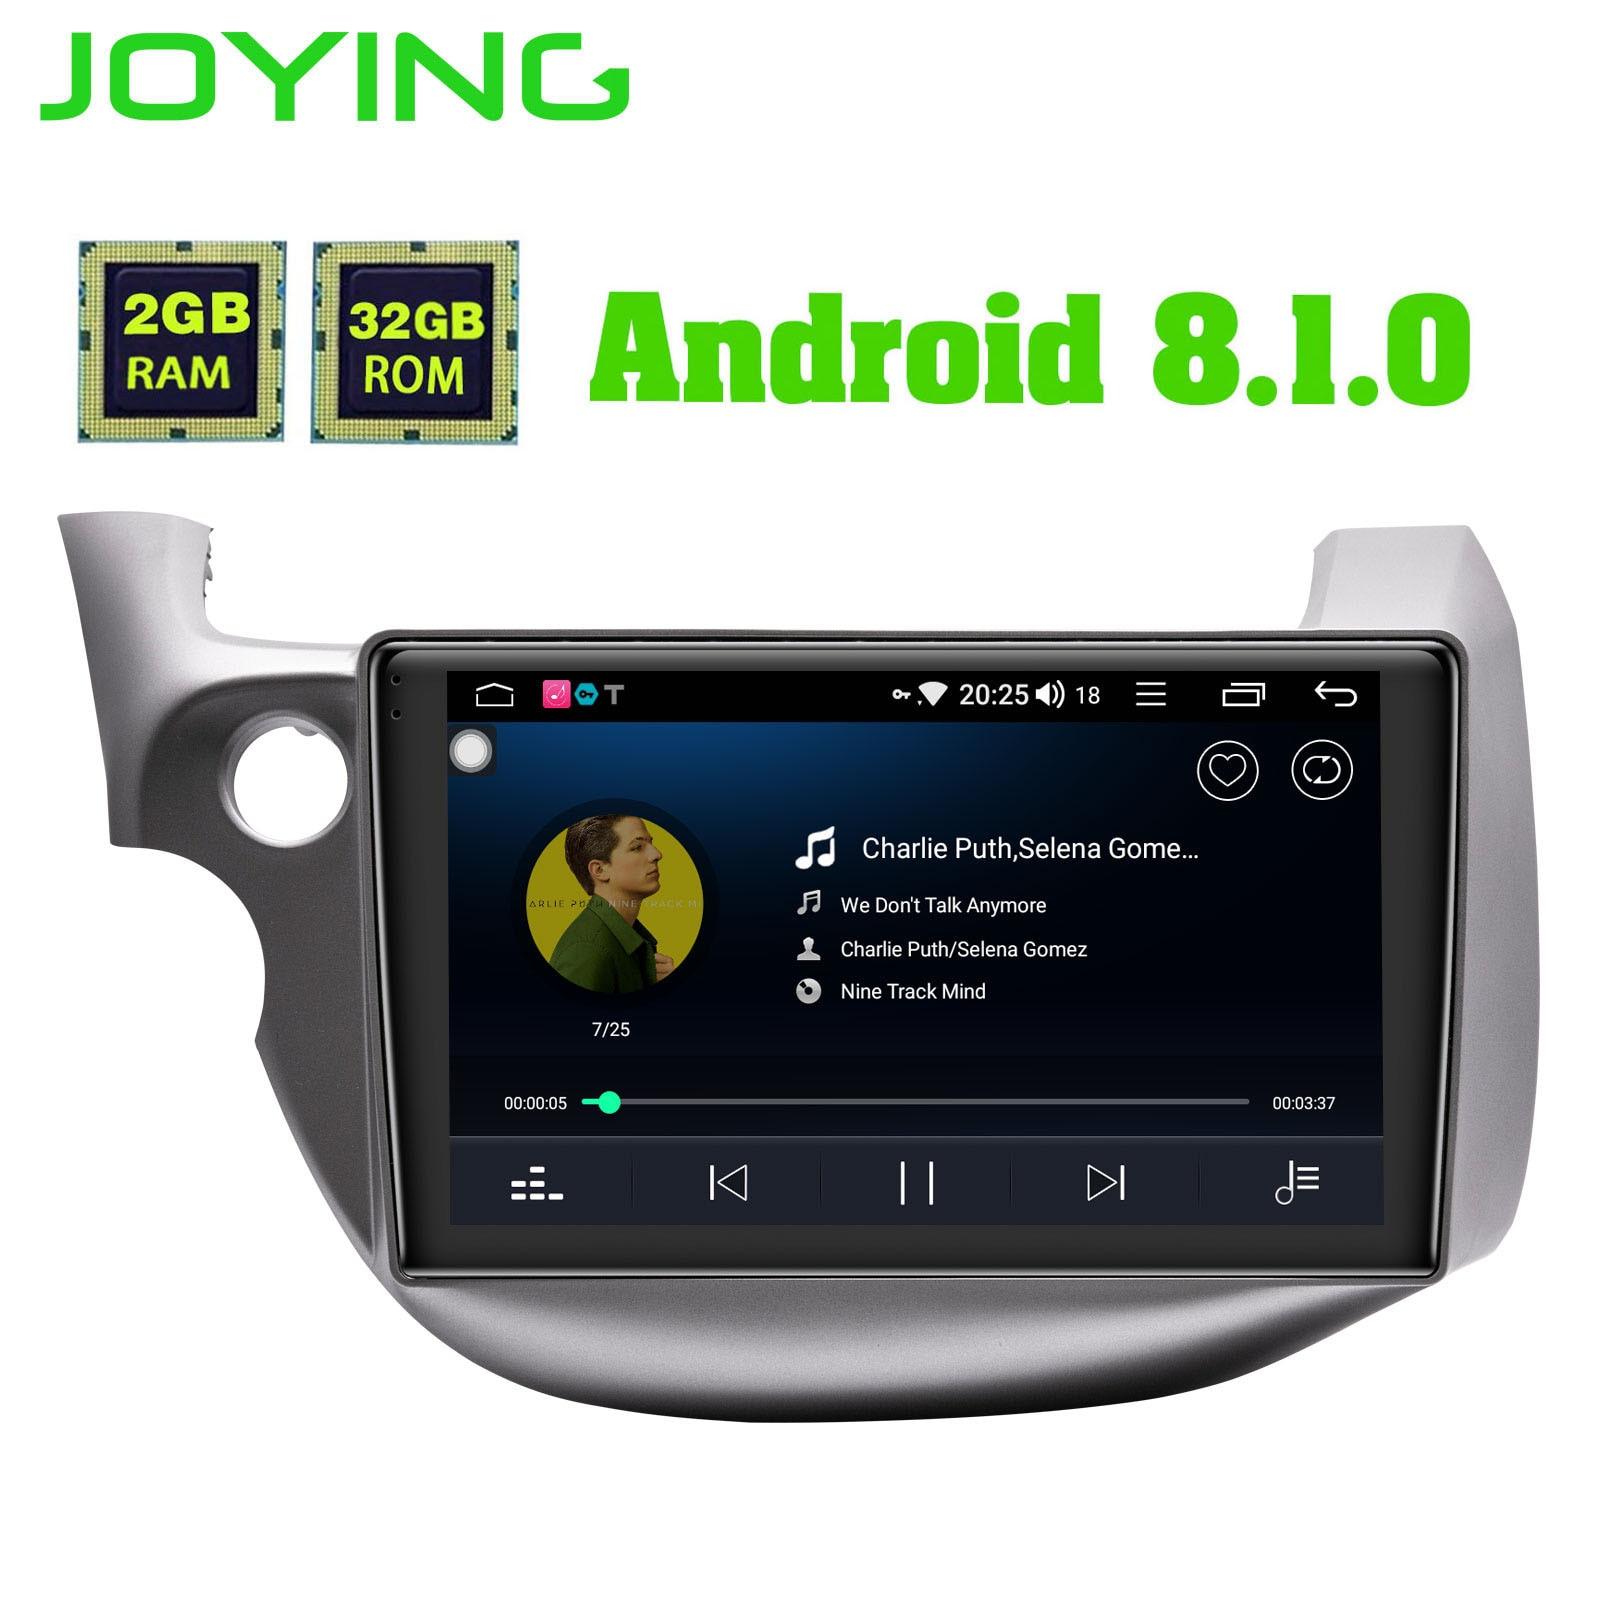 JOYING Android 8 1 Car Multimedia Player Tape Recorder GPS Navigator 8 core 32GB ROM 2GB